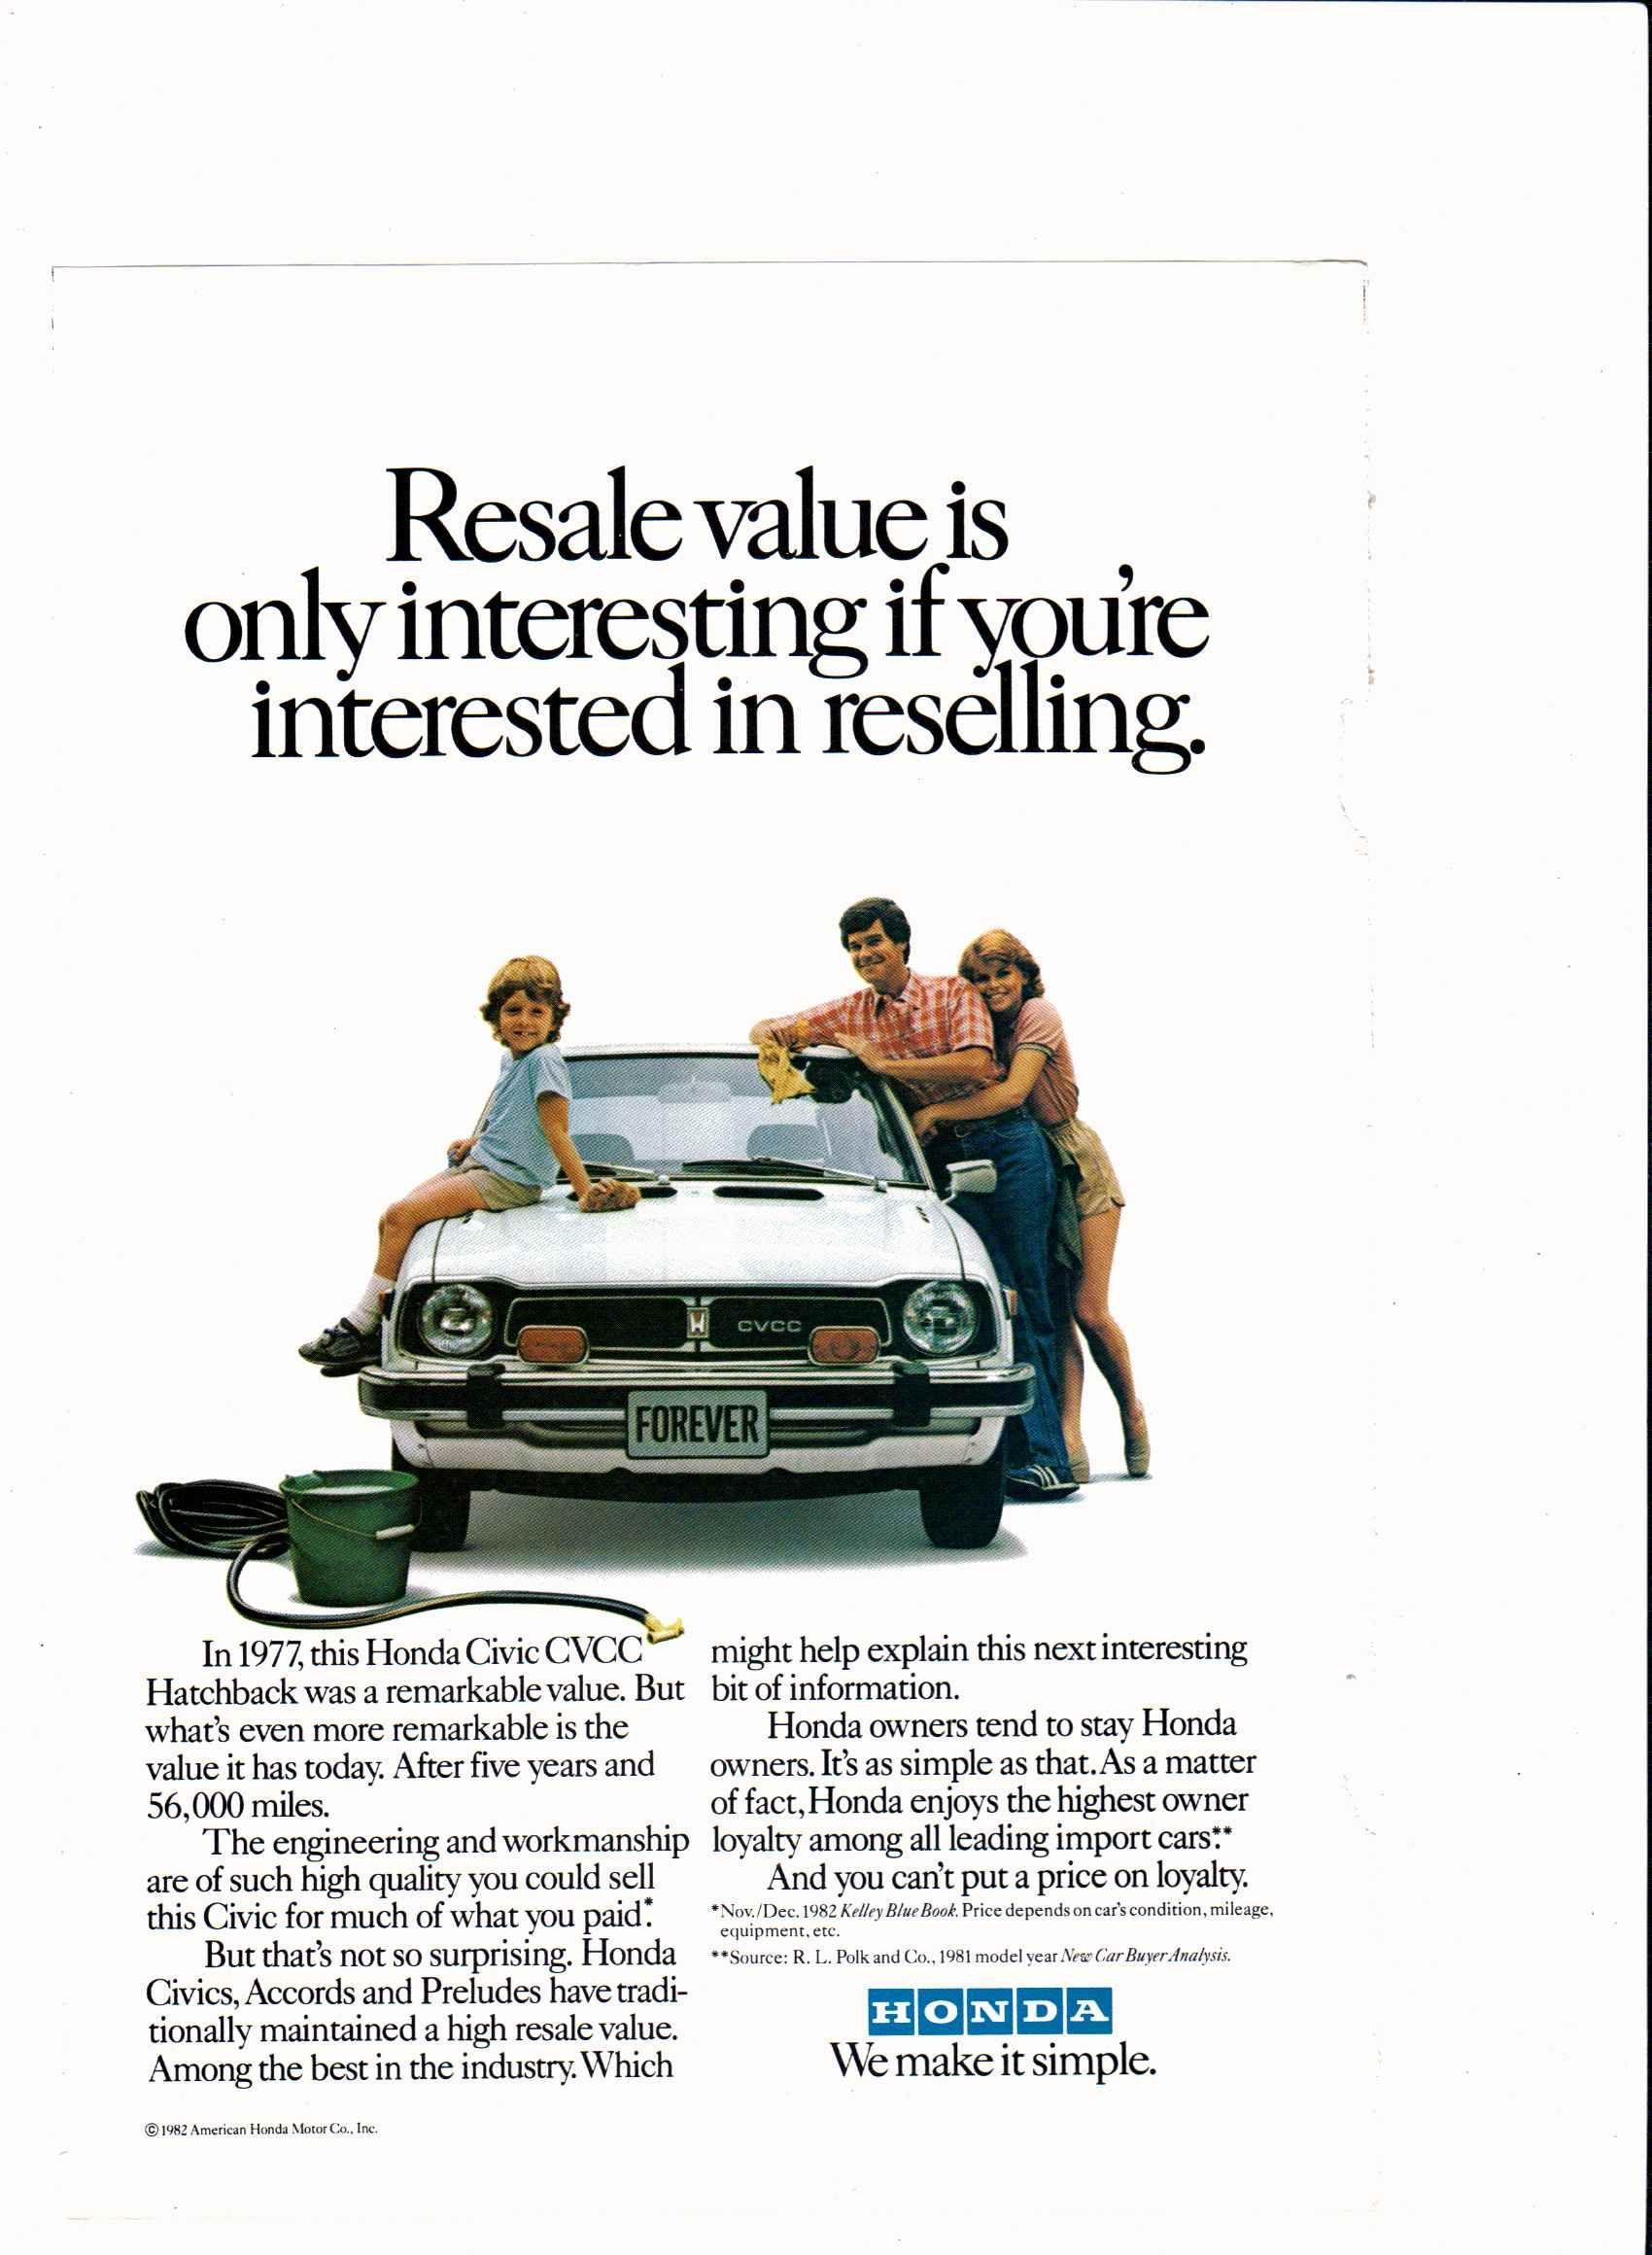 1977 Honda Civic Cvcc Ad Vintage Vehicle Ads Pinterest 1970